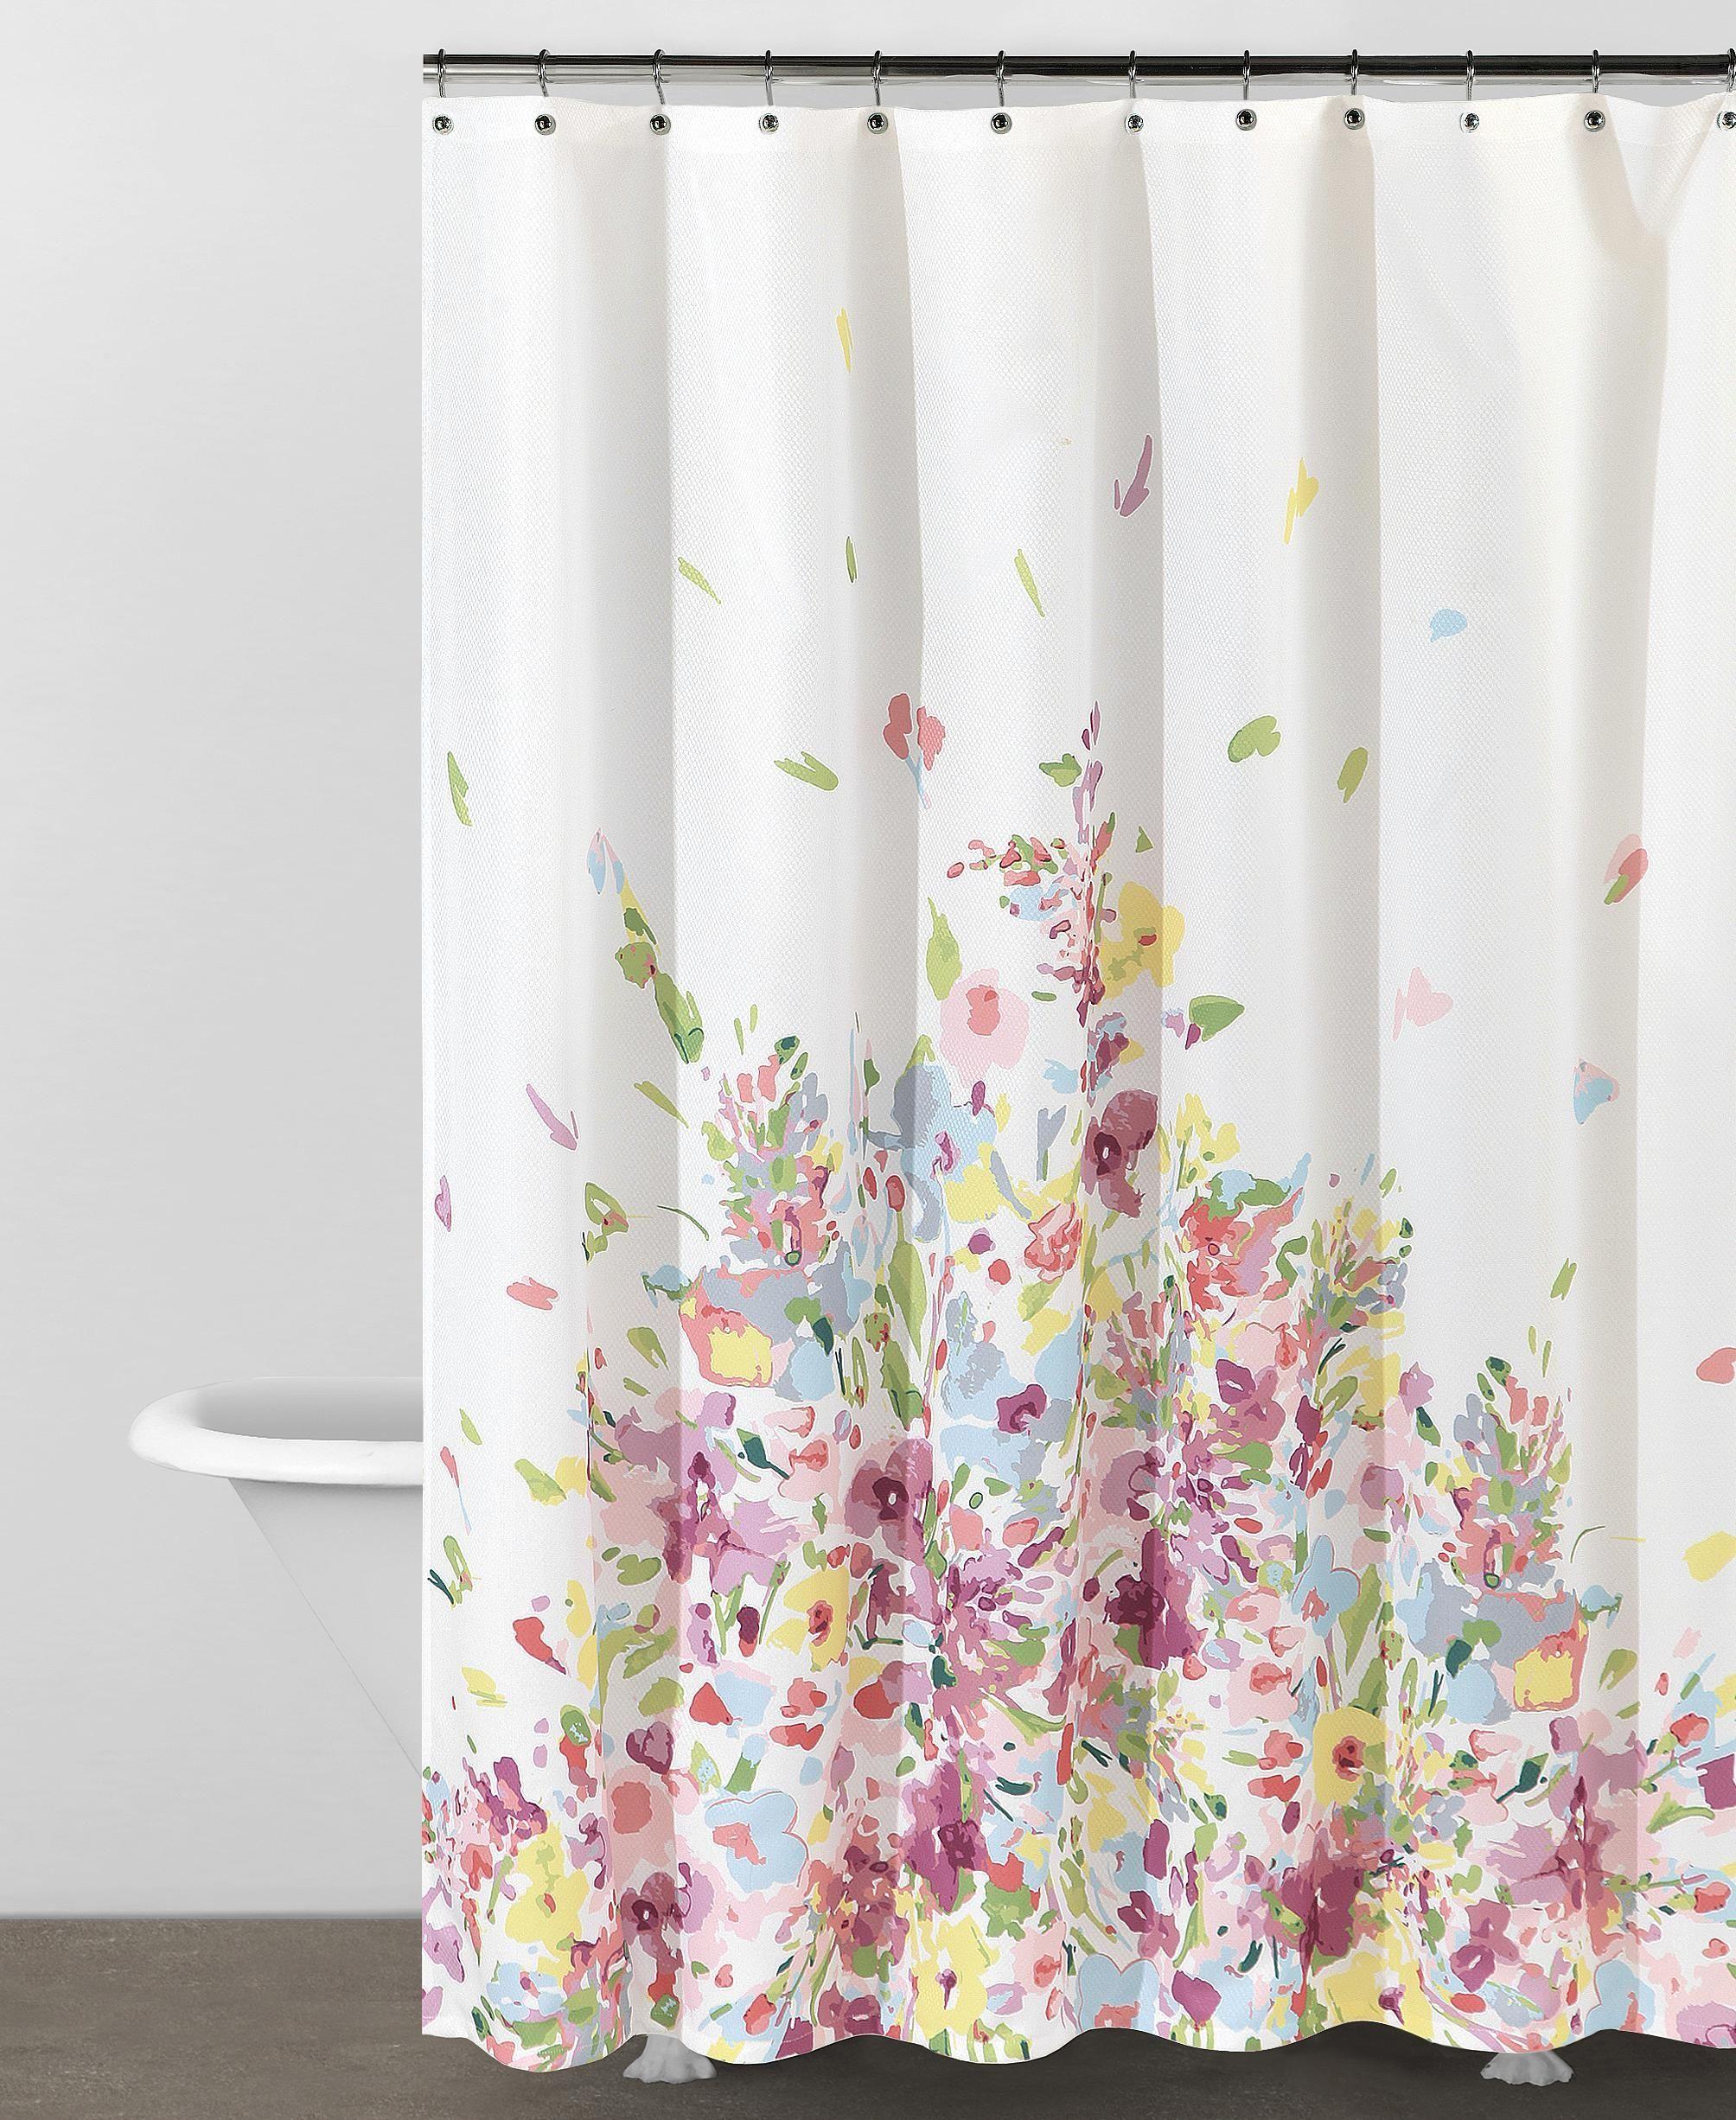 Dkny Shower Curtain Watercolor Cortinas De Bano Cortinas Pintadas Diseno De Banos